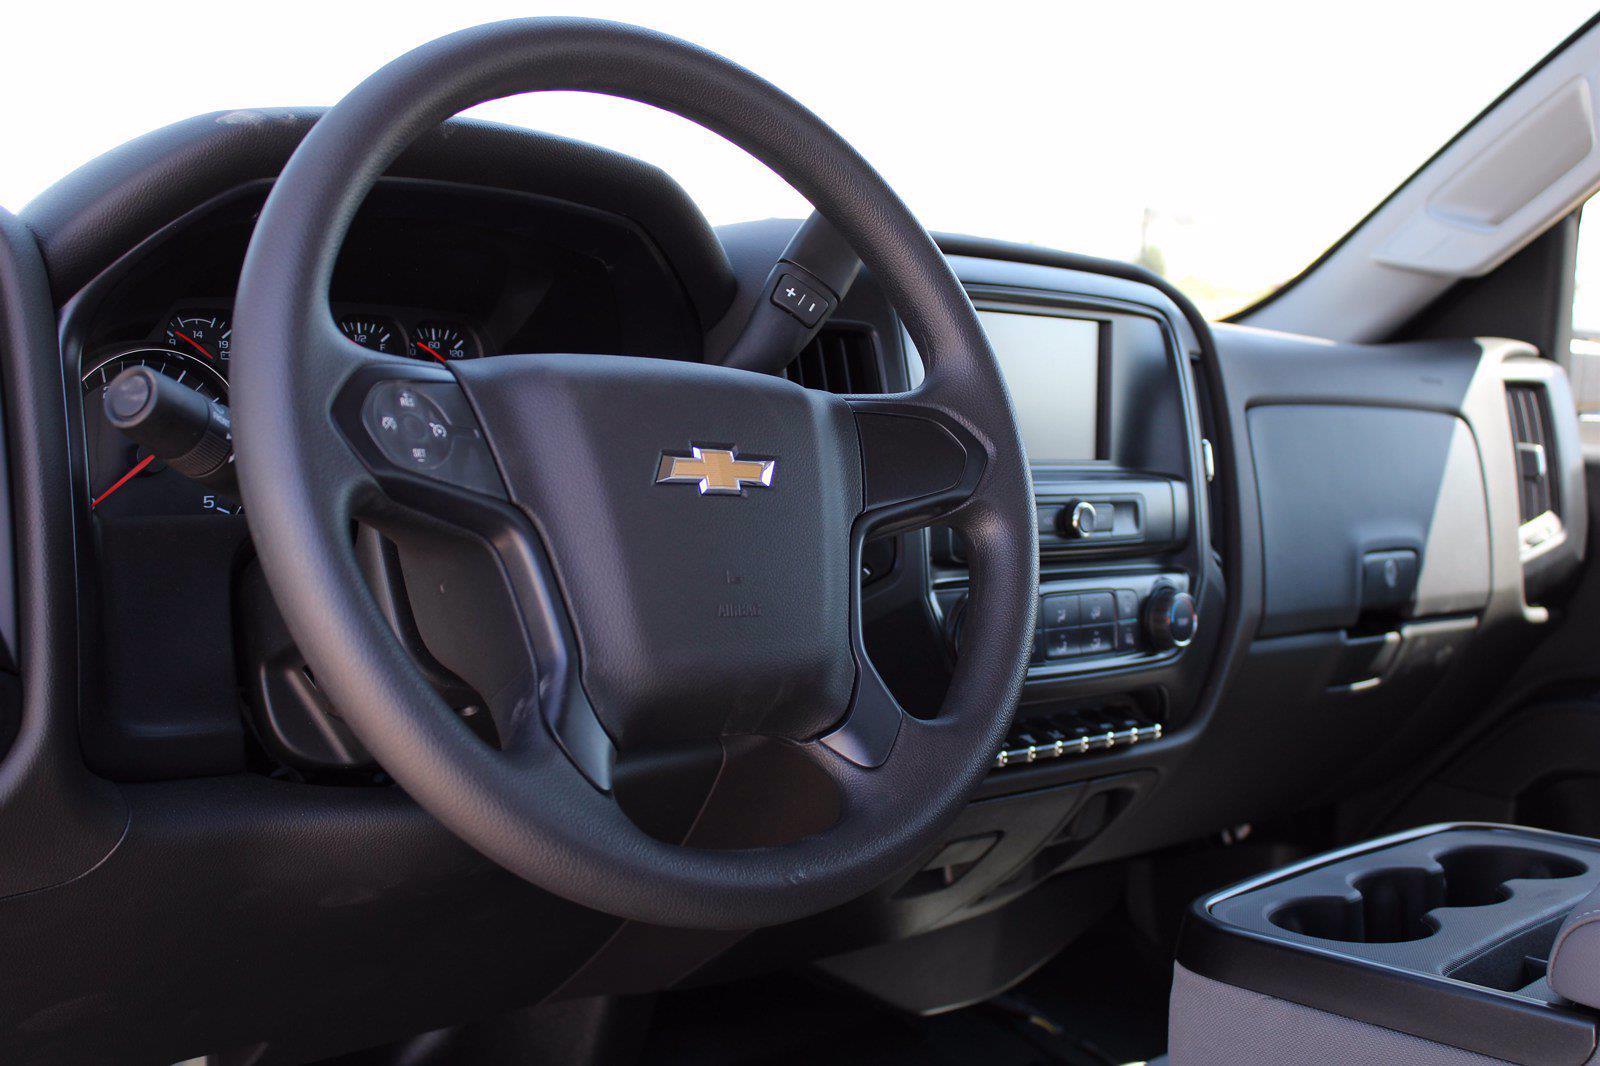 2020 Chevrolet Silverado 5500 DRW 4x2, Cab Chassis #D100459 - photo 4